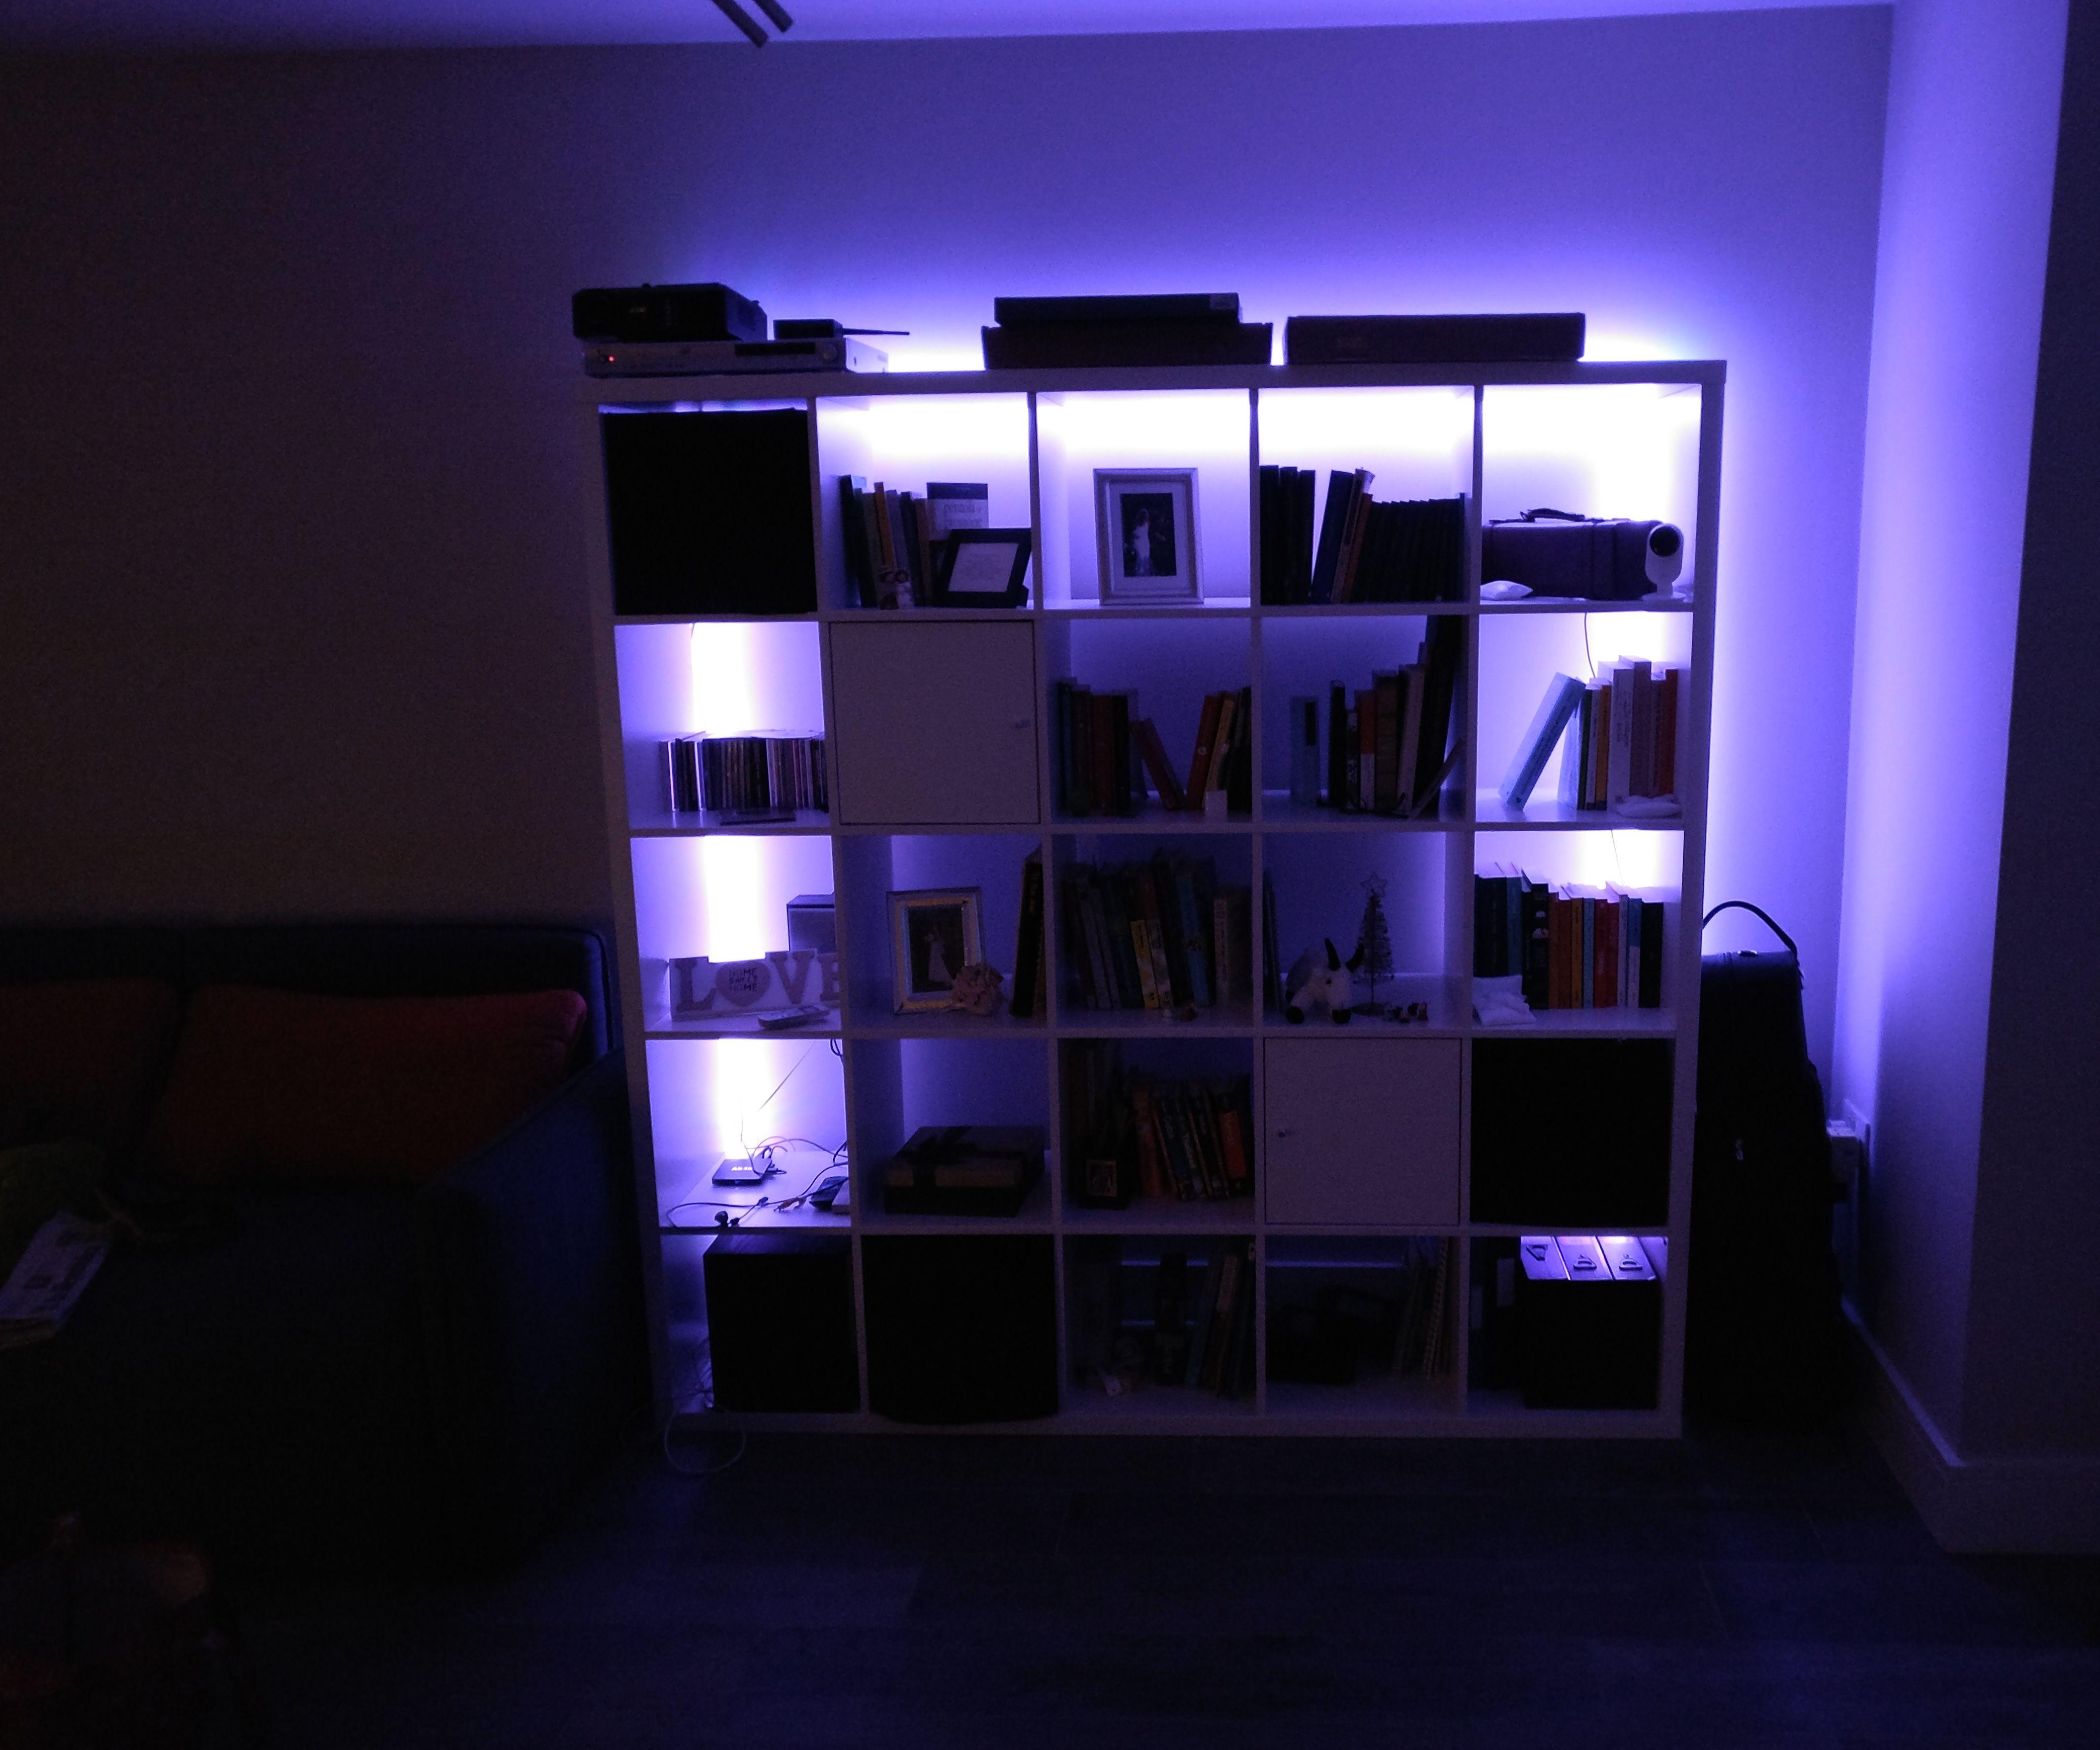 Glowing IKEA bookshelf